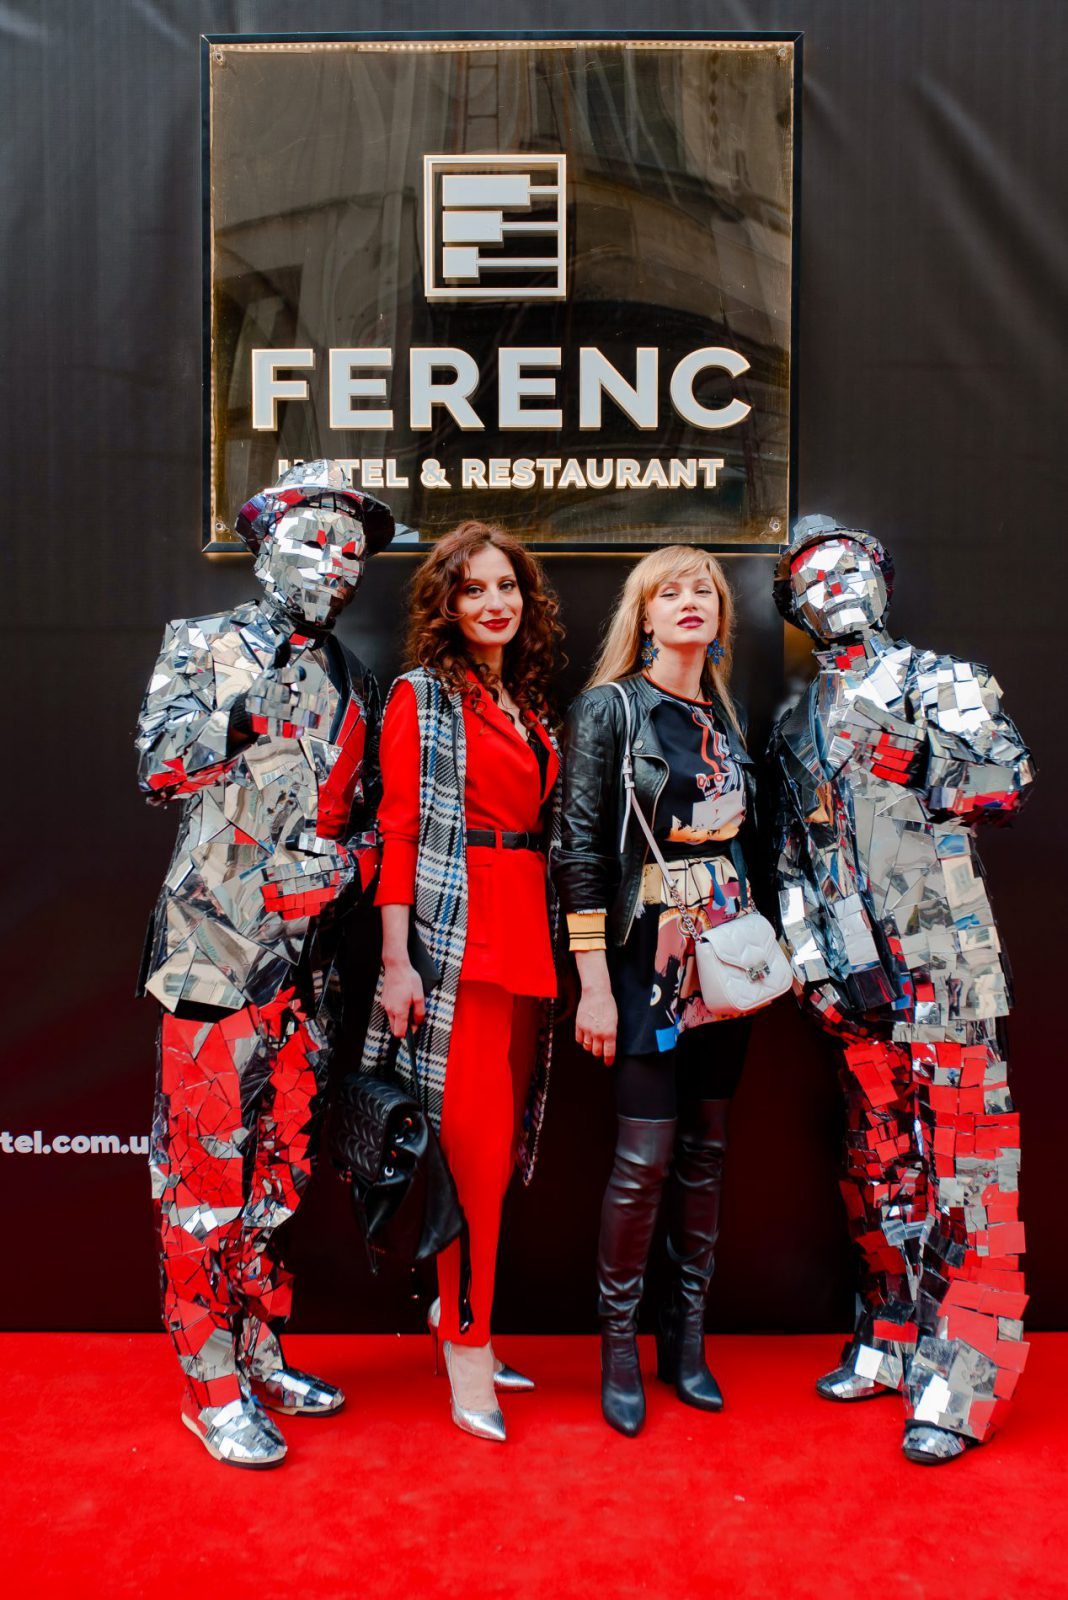 Ferenc0166